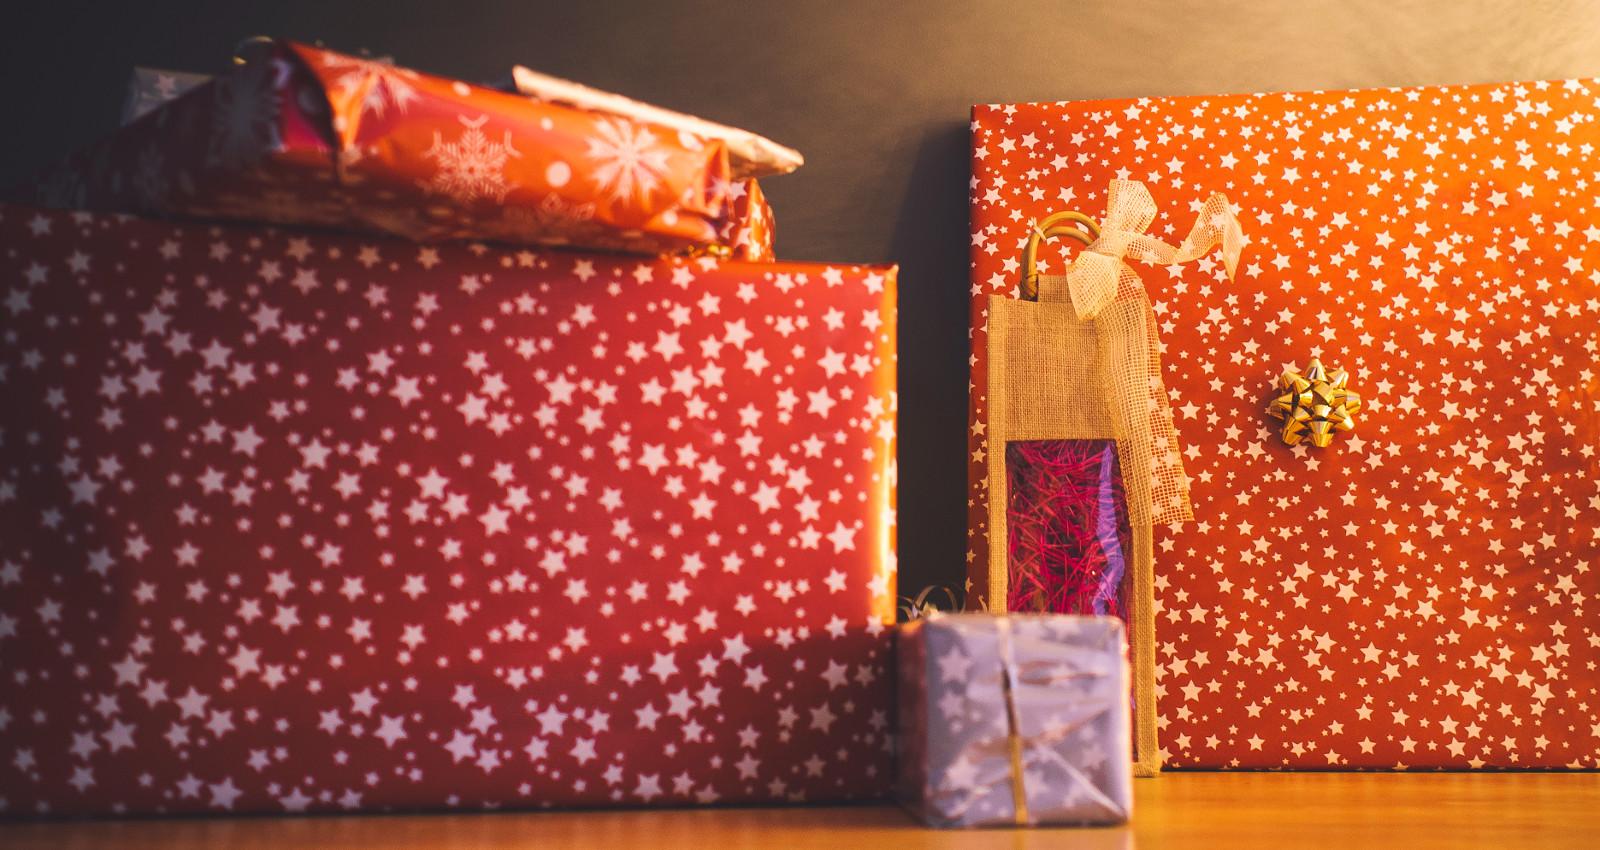 Technik-Geschenke zu Weihnachten - RandomBrick.de